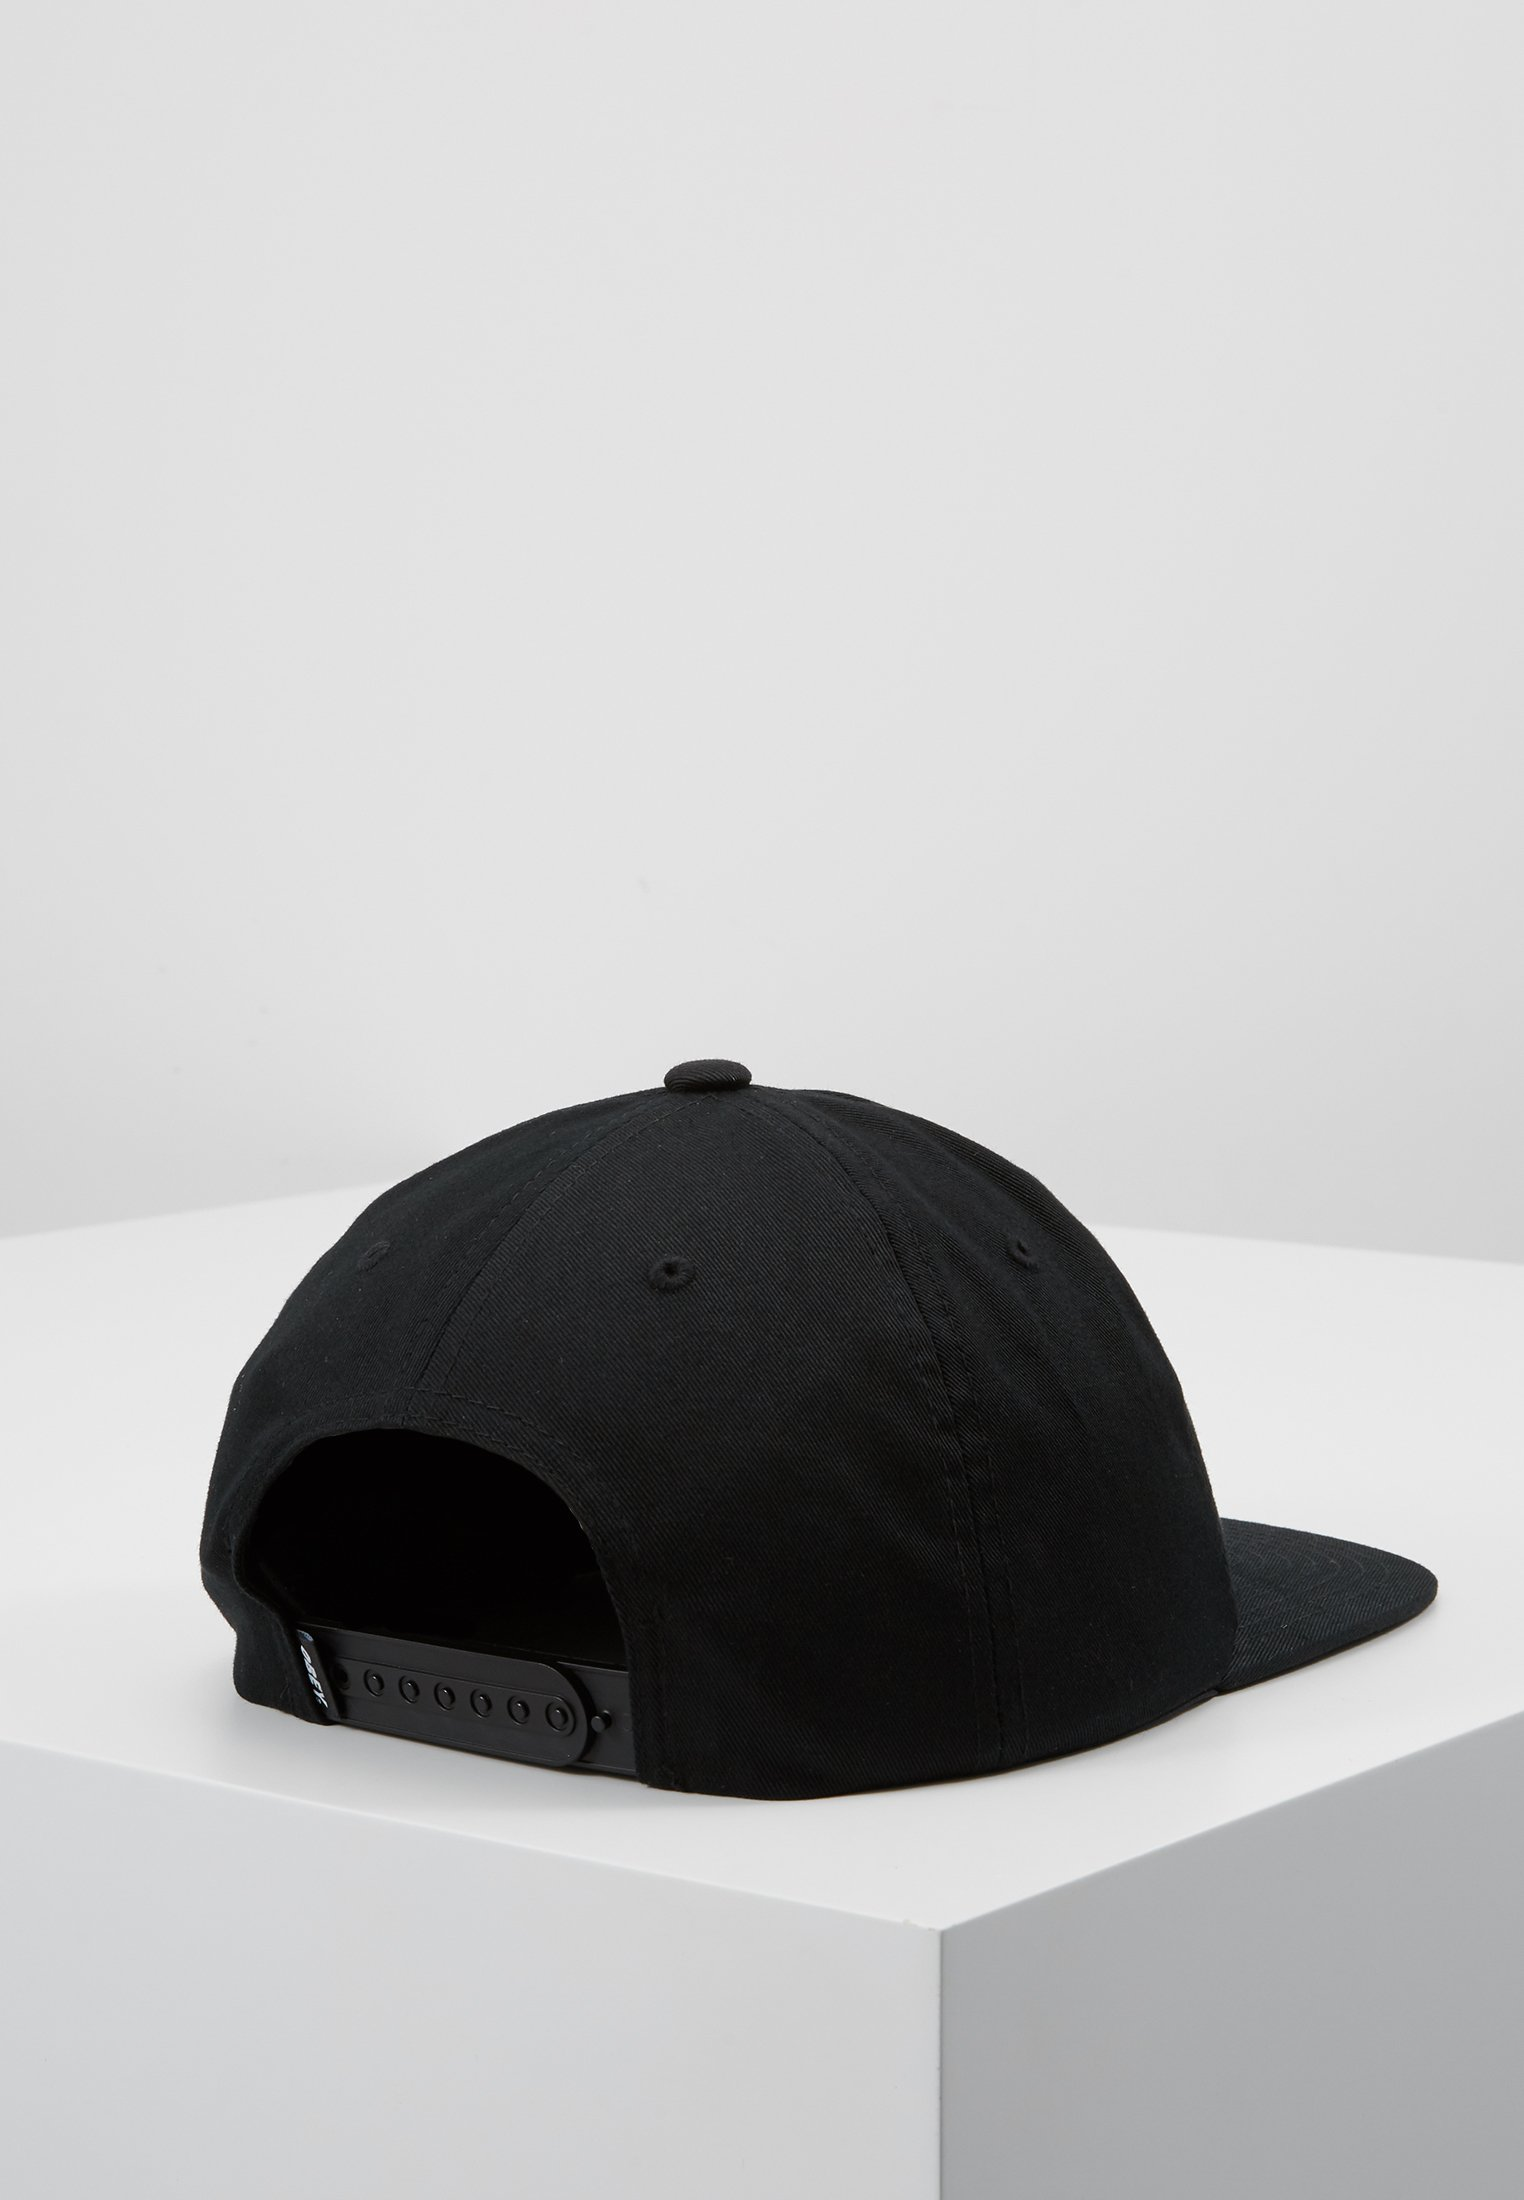 Obey Clothing SnapbackCasquette Black Champion Panel cARL5q34j